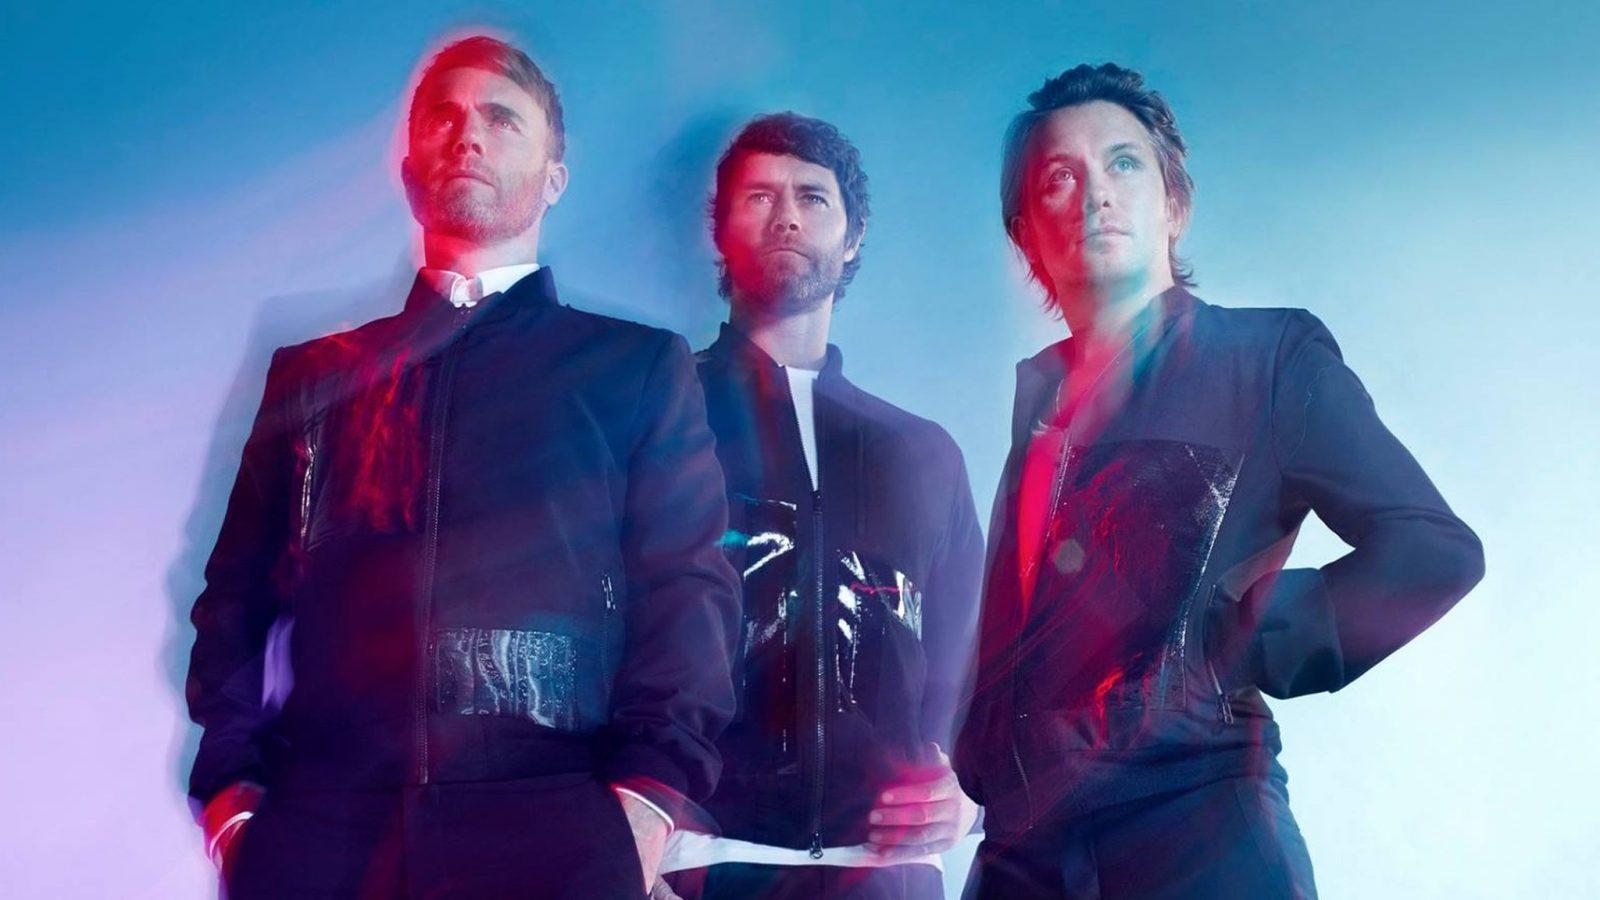 Take That 2015 tour promo